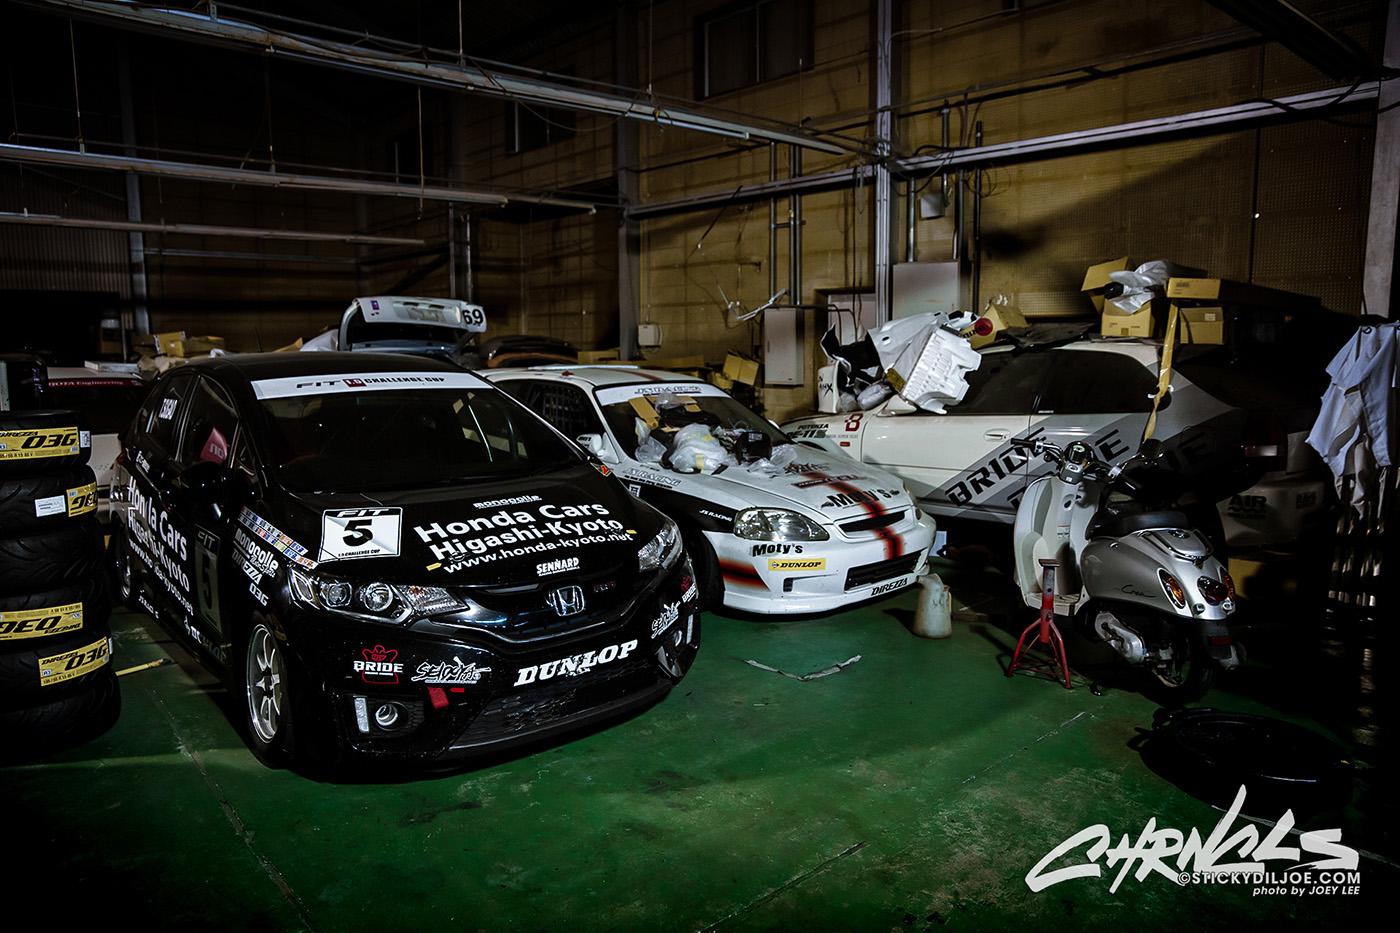 Garage Excellent and The Legendary Sennard – CHRNCLS Vlog 2019 #5